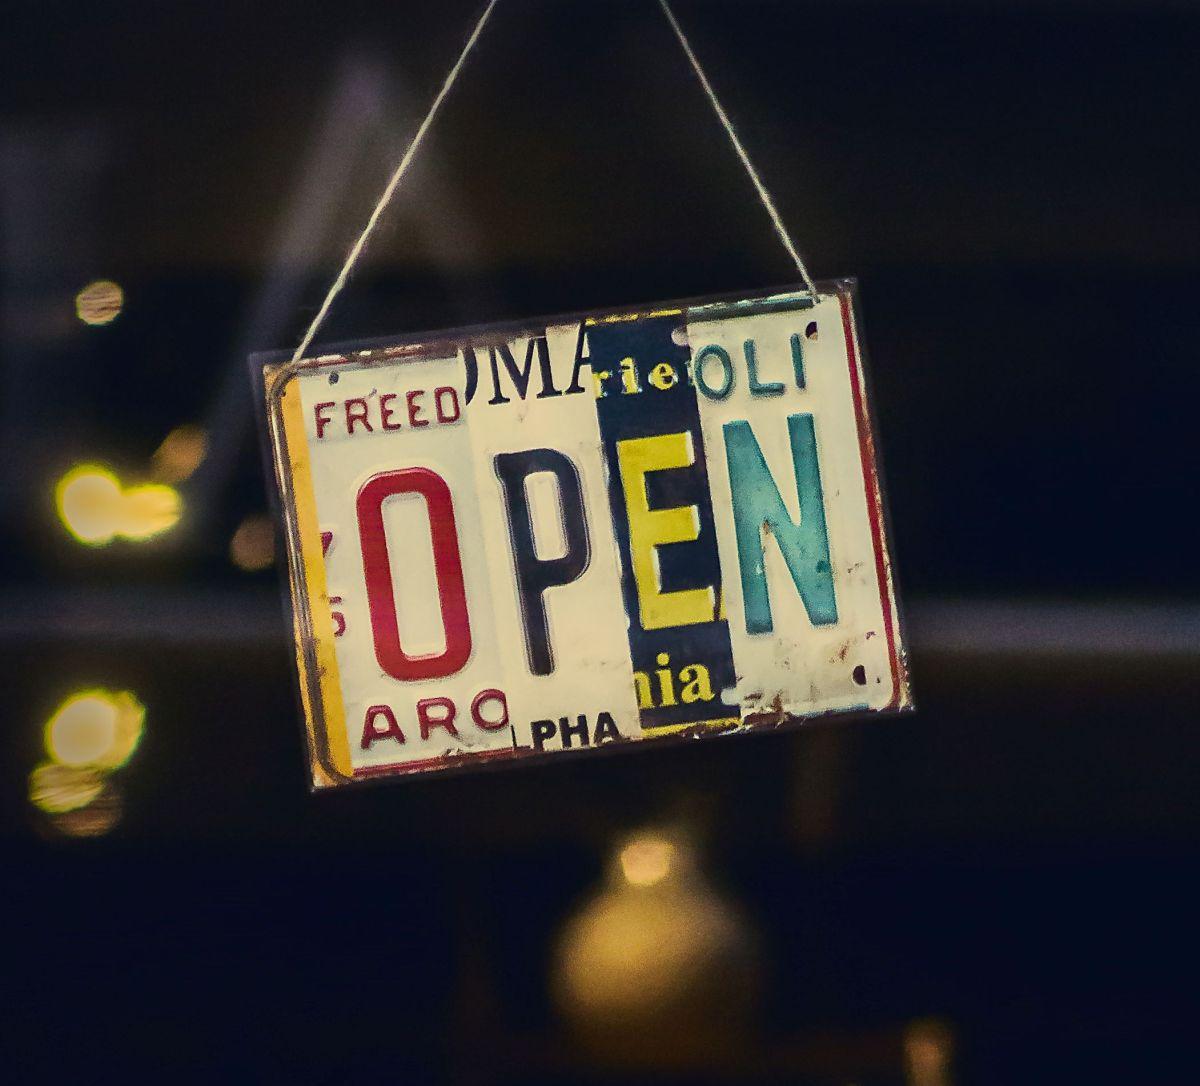 Open james-sutton-mcjvw2570iA-unsplash